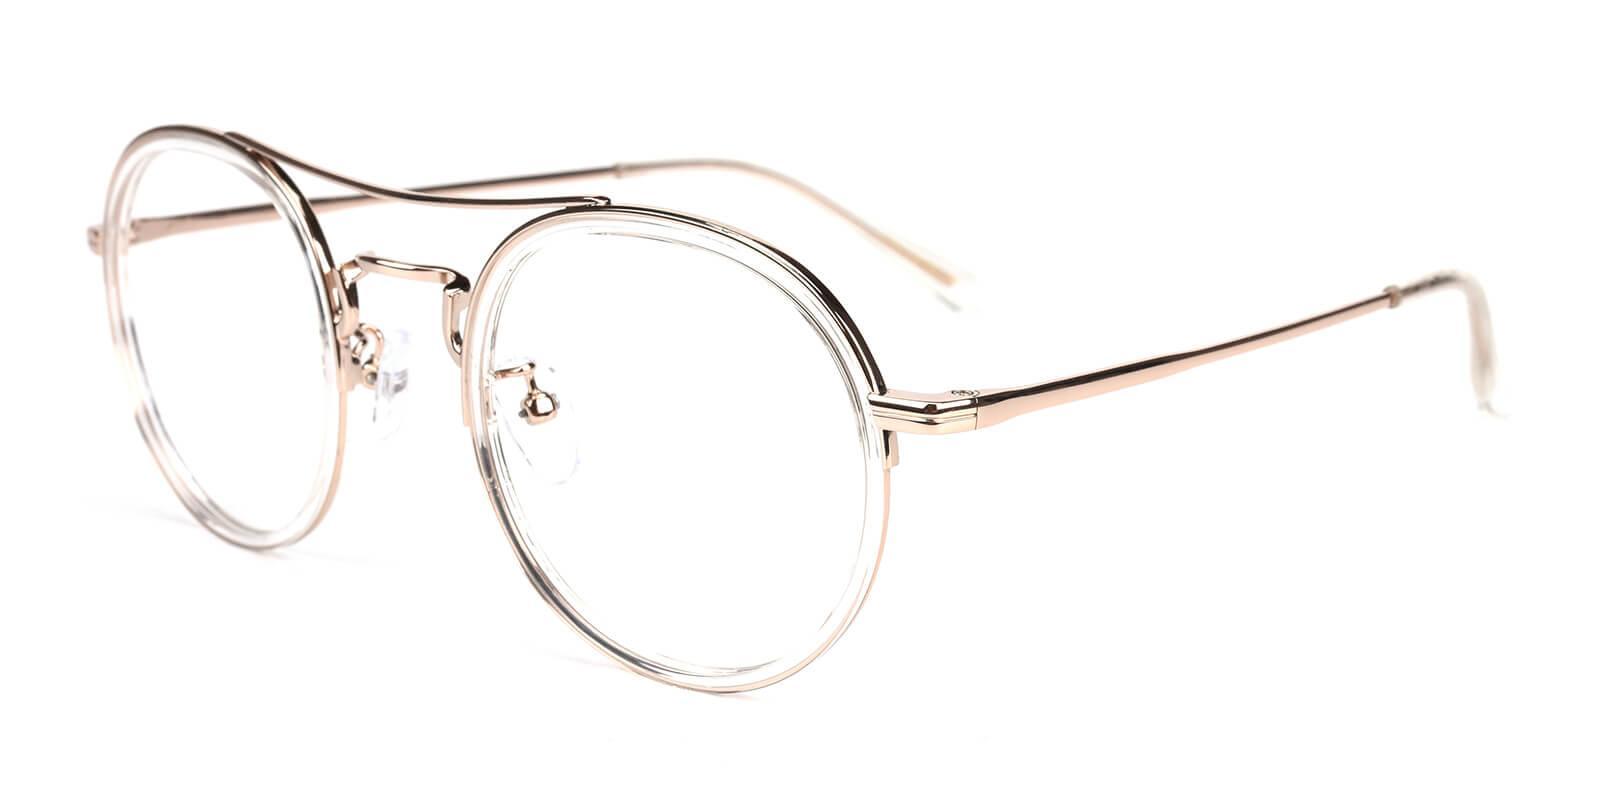 Teddy-Translucent-Aviator-Combination-Eyeglasses-additional1